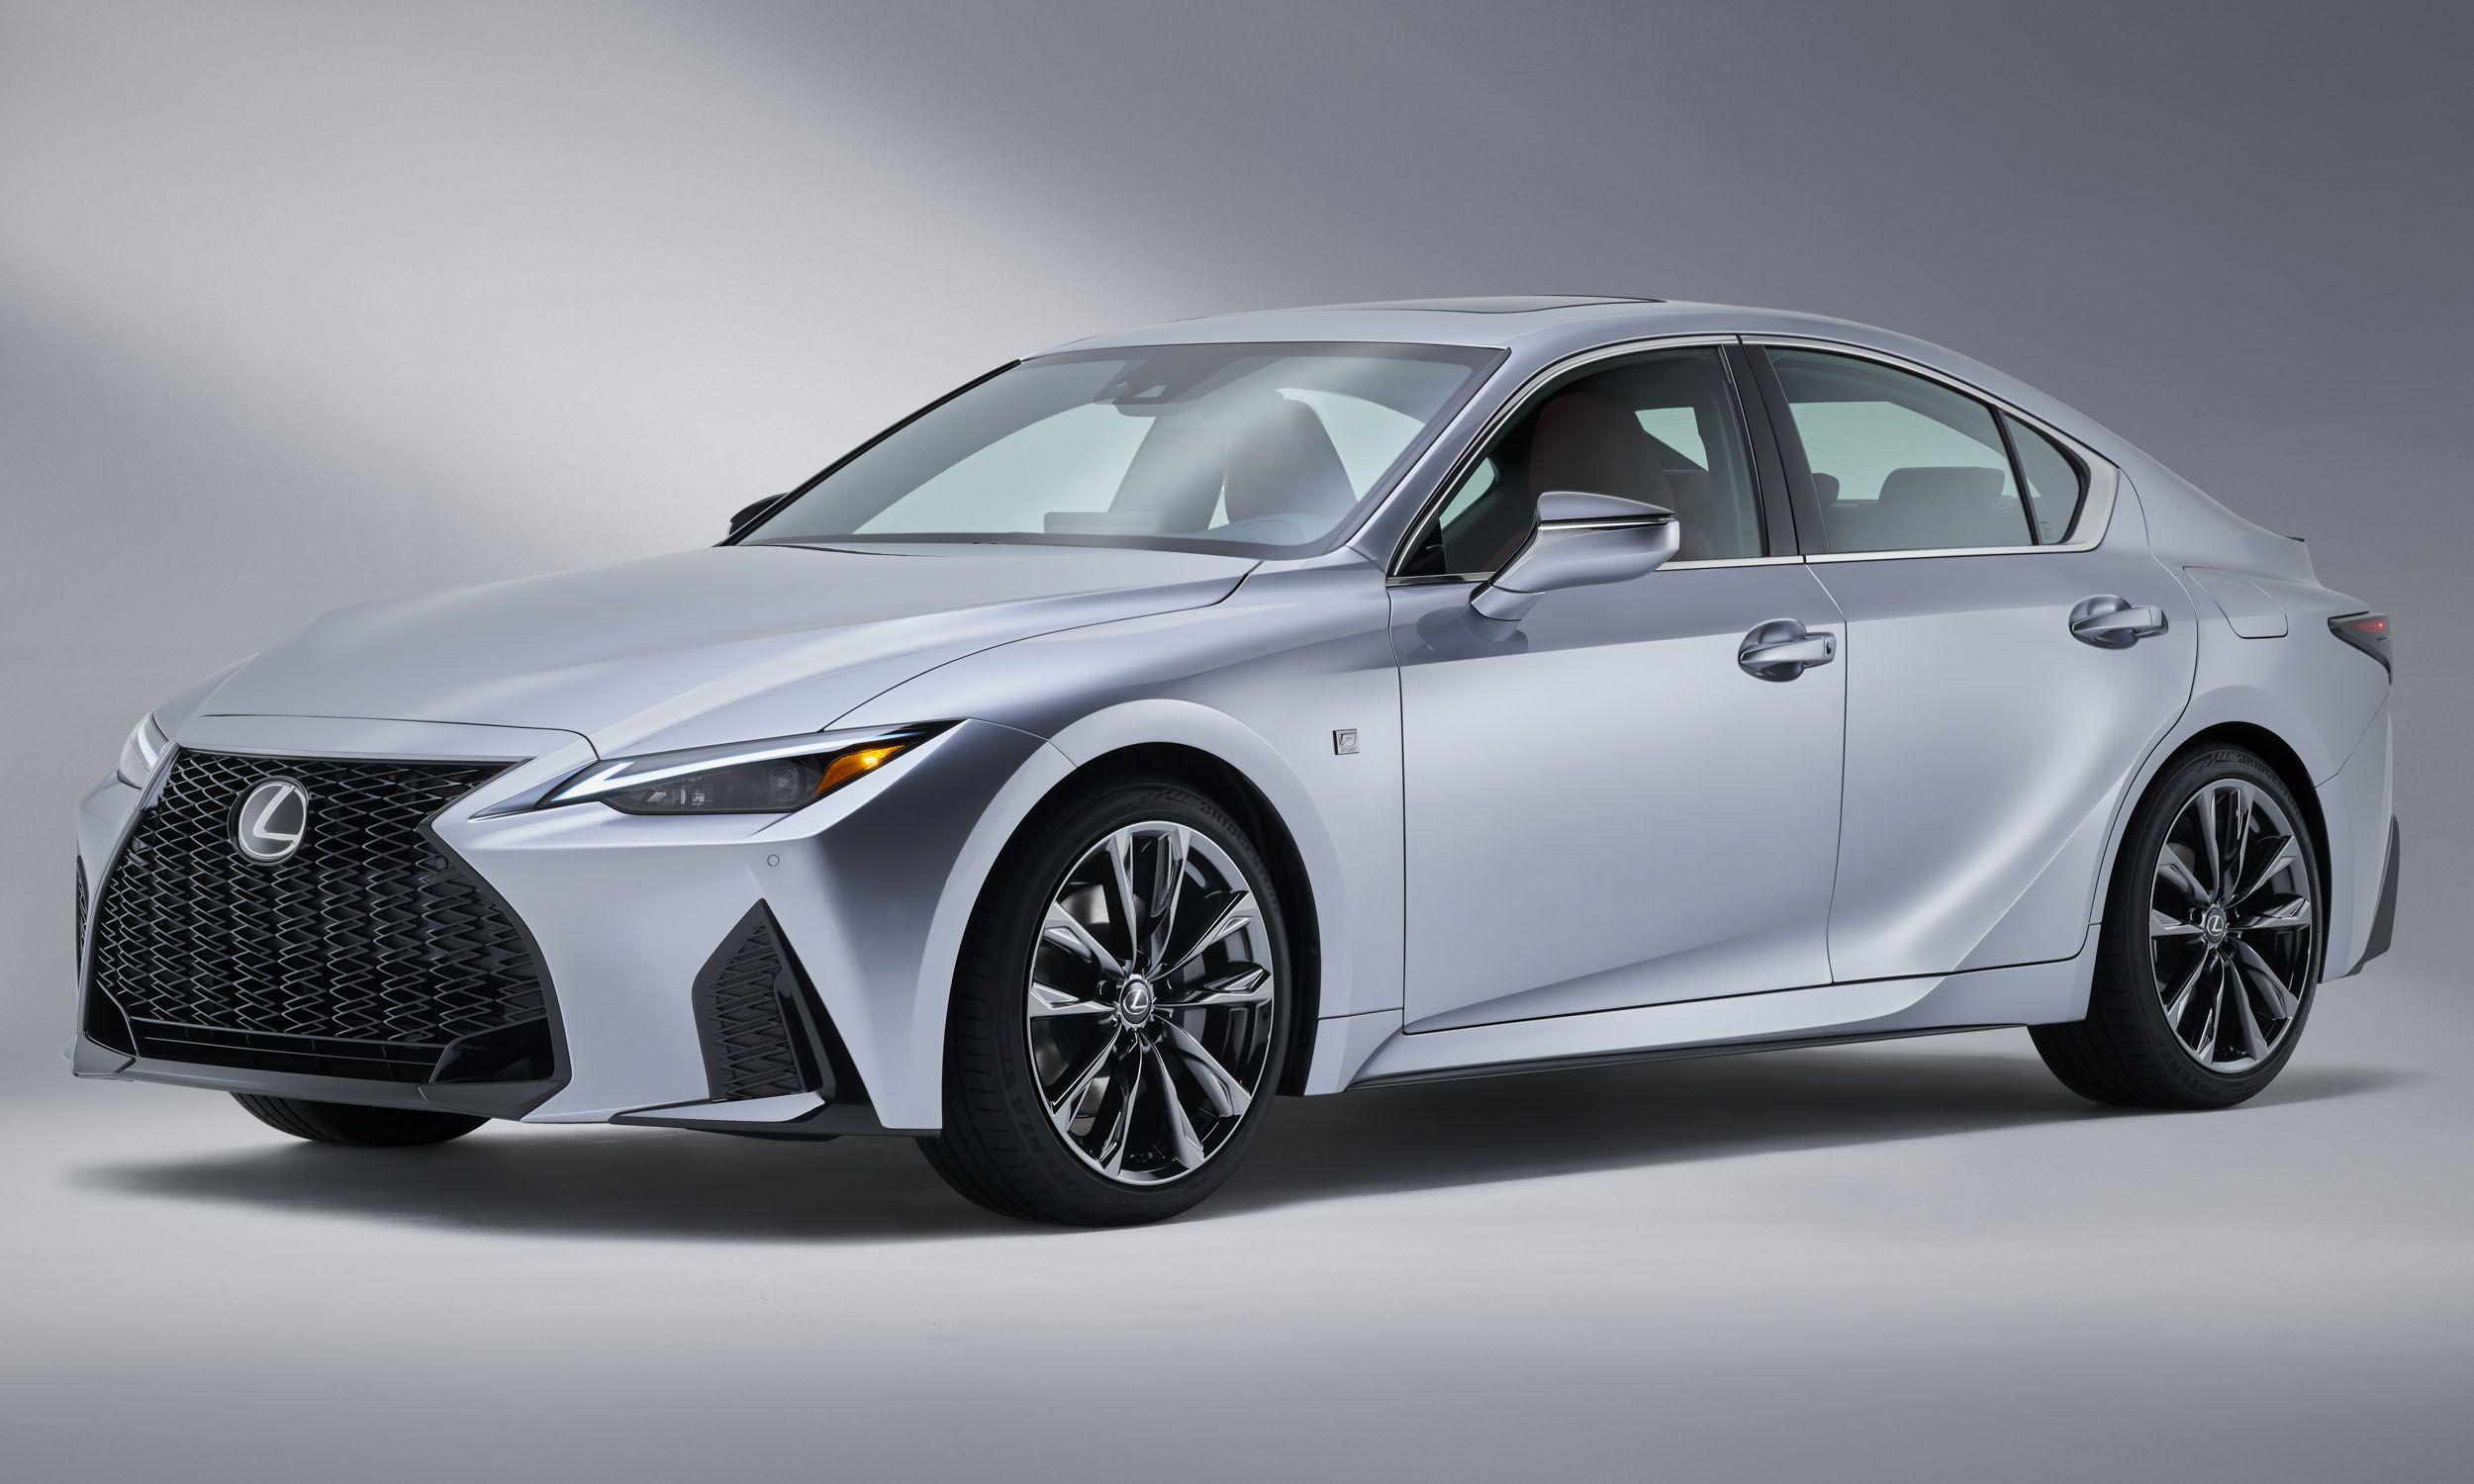 2021 Lexus Is First Look In 2020 New Lexus Sports Sedan Lexus Sports Car